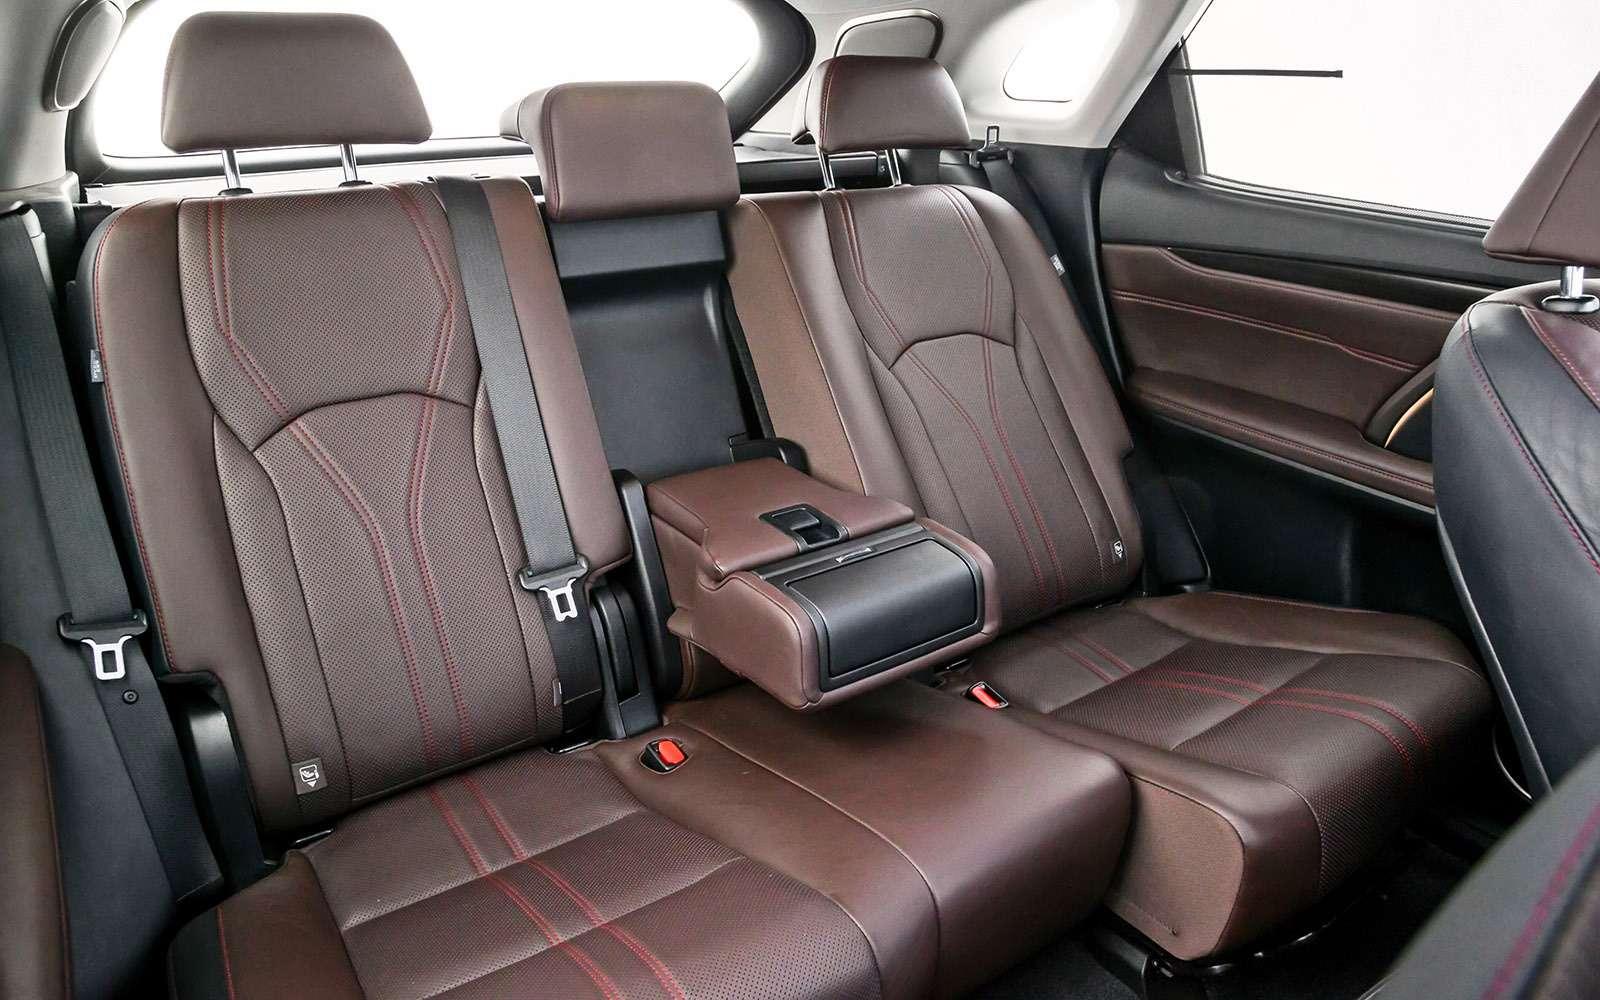 Тест премиум-кроссоверов: Lexus RX350, Cadillac XT5и Jaguar F-Pace— фото 721786